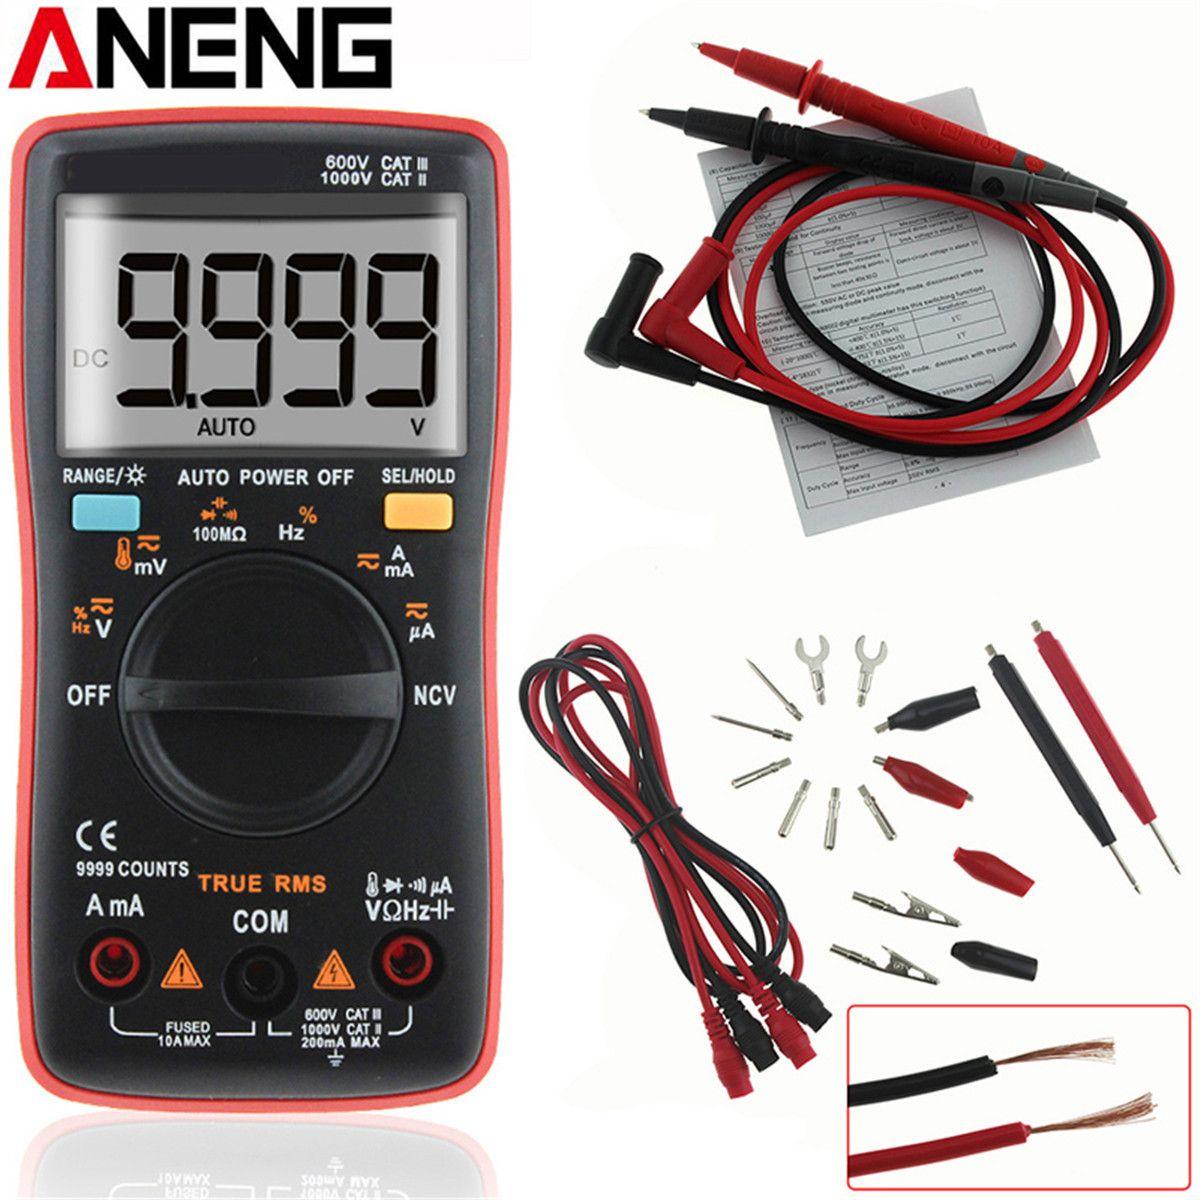 ANENG AN8009 Auto Range Digital Multimeter 9999 Counts Backlight AC/DC Ammeter Voltmeter Ohm Transistor Tester Multi Meter